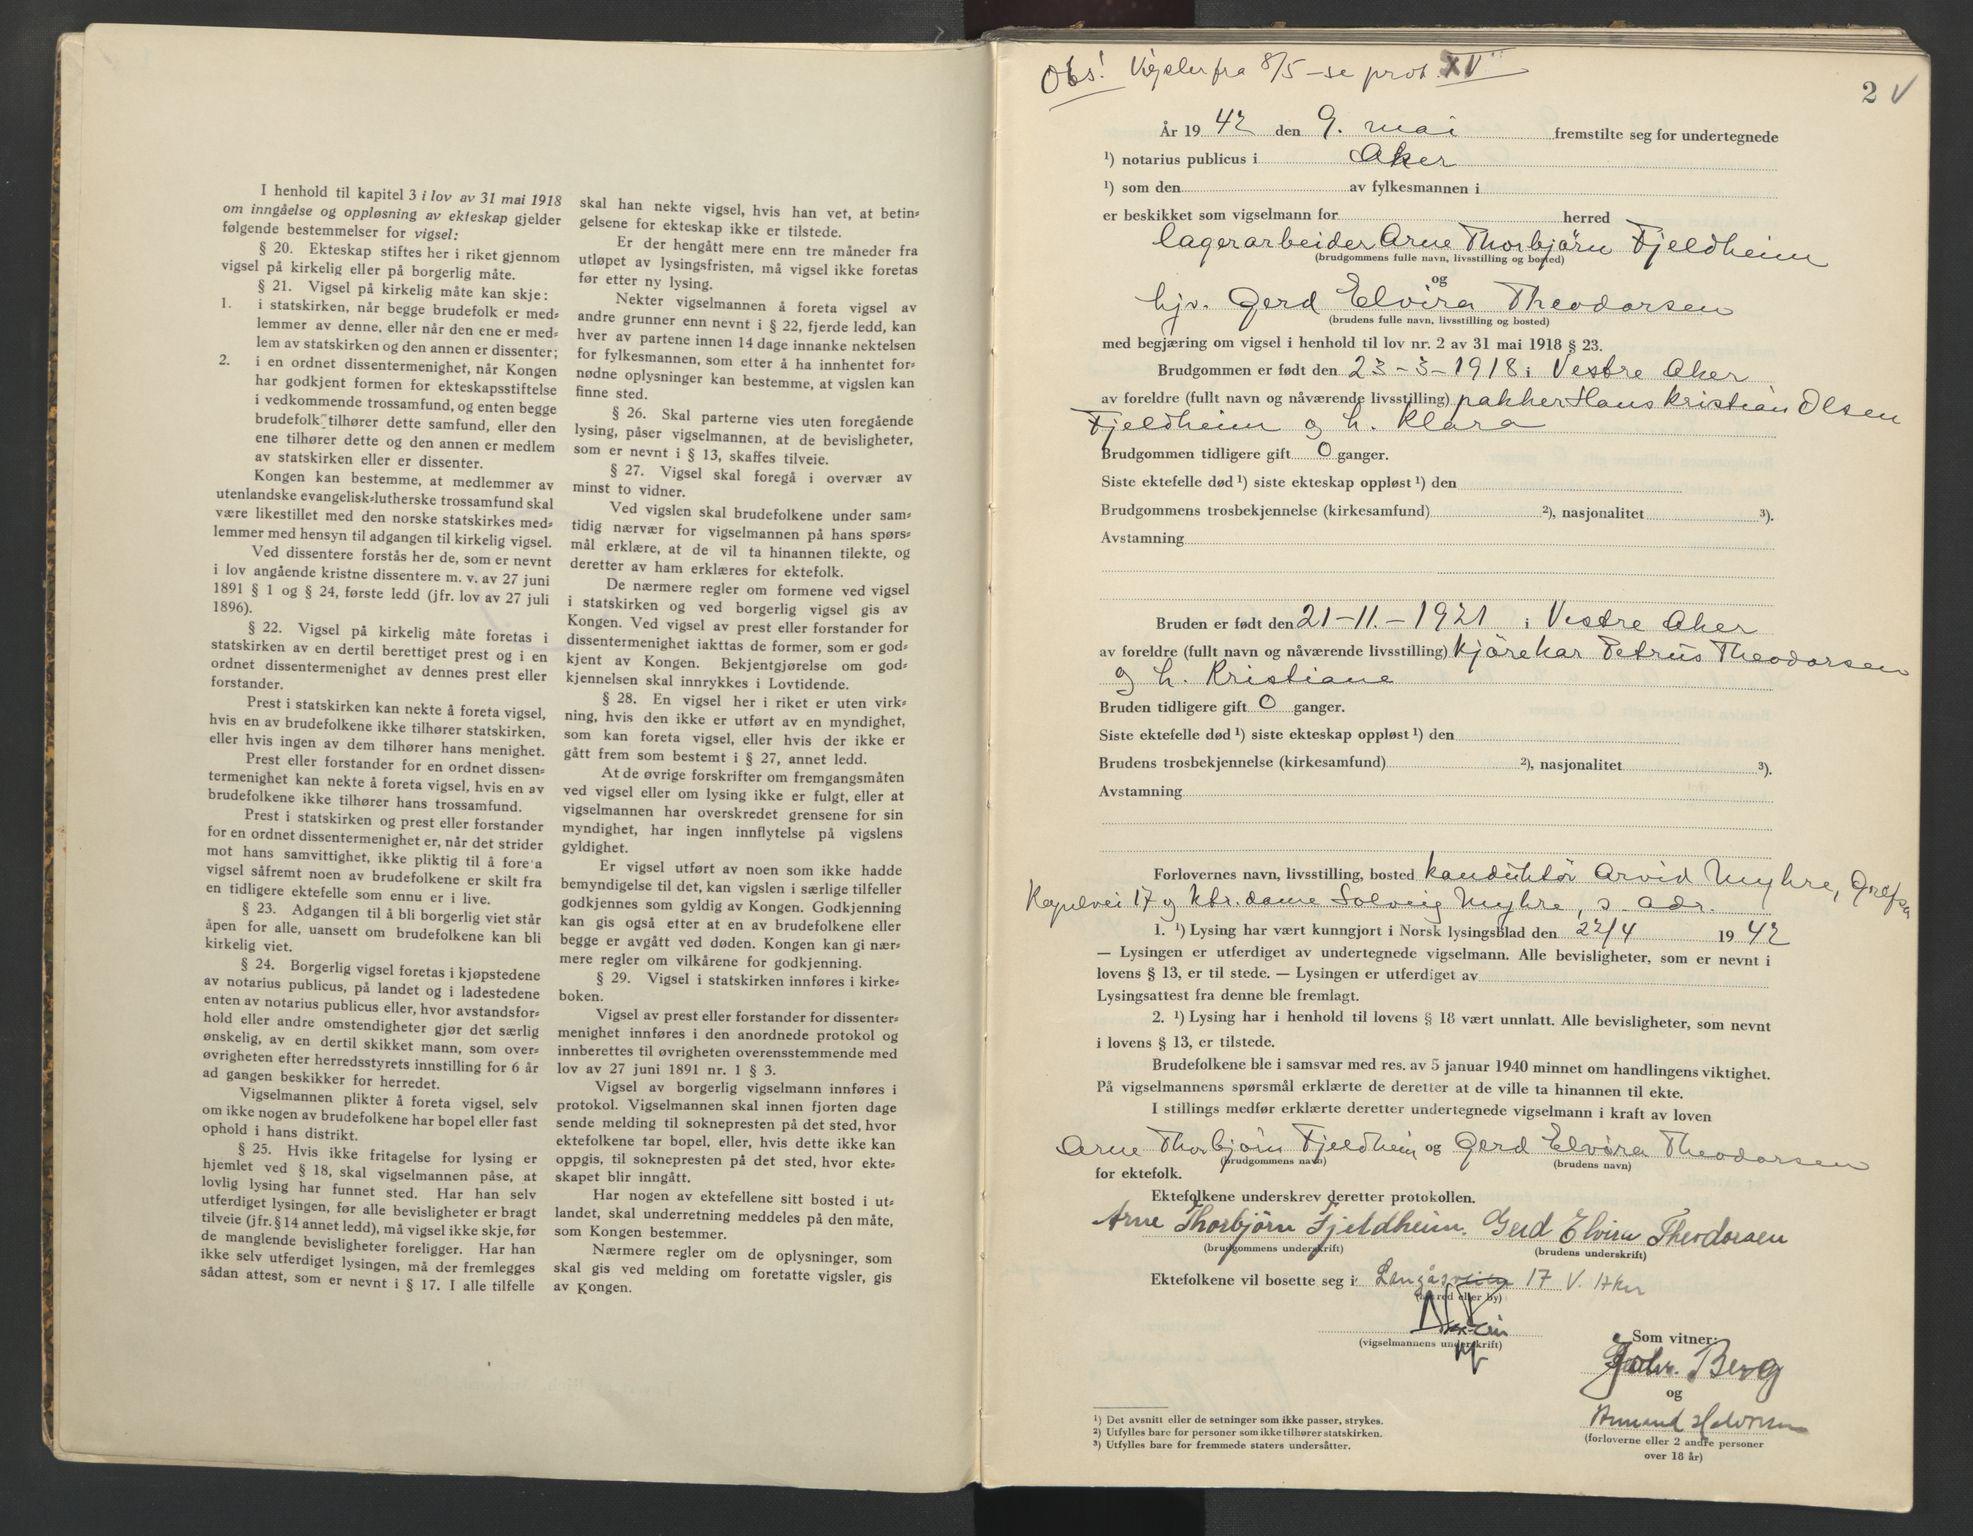 SAO, Aker sorenskriveri, L/Lc/Lcb/L0016: Vigselprotokoll, 1942, s. 2